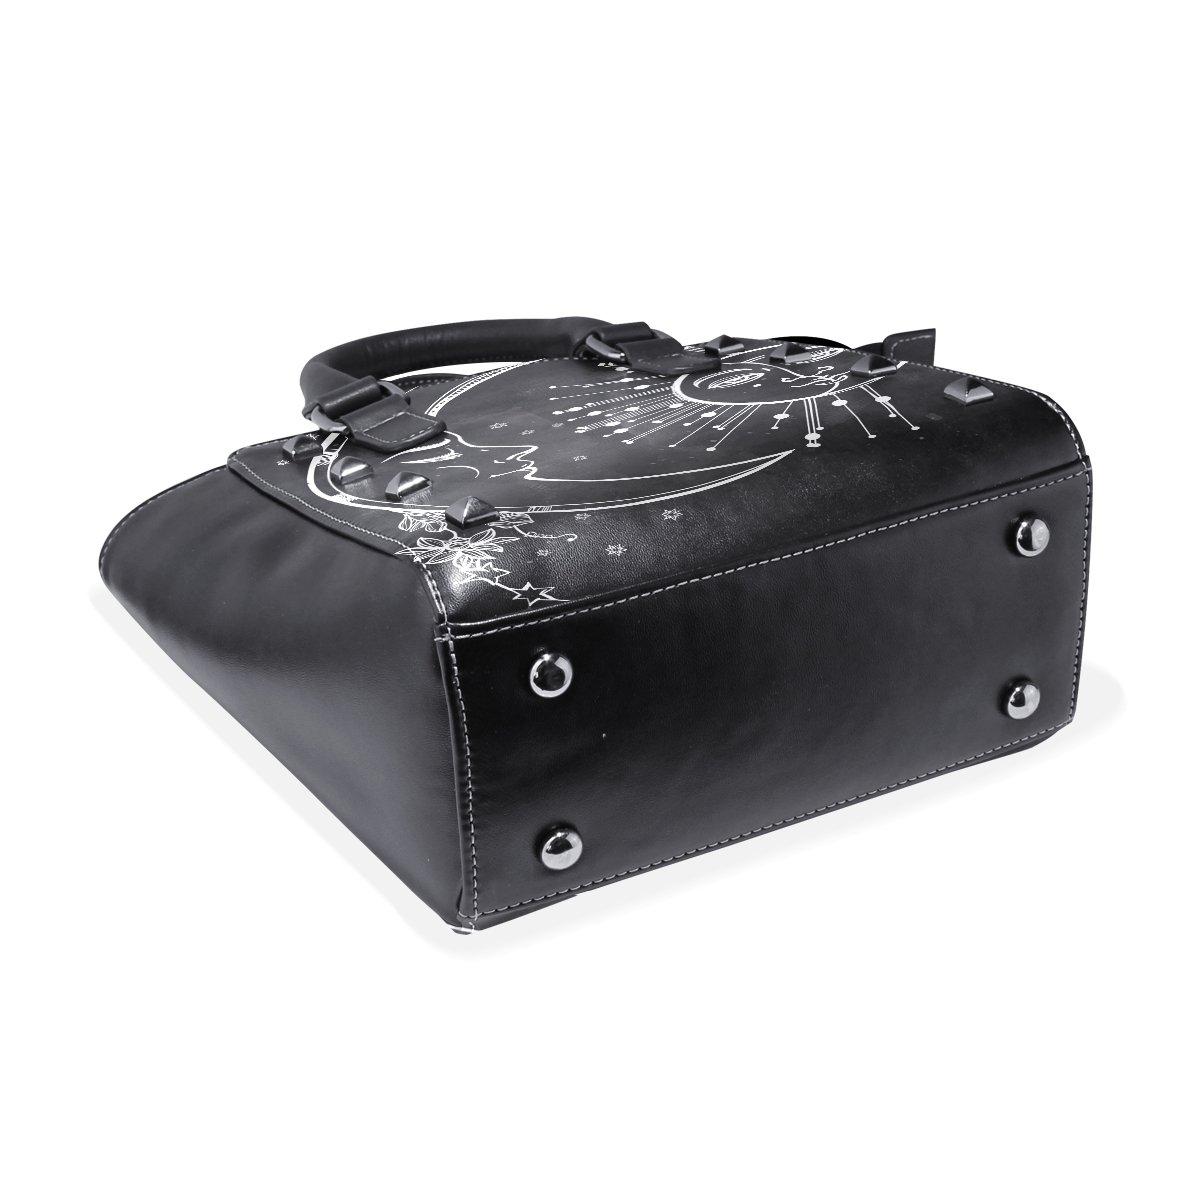 Use4 Womens Black Moon Sun Star Flower Rivet PU Leather Tote Bag Shoulder Bag Purse